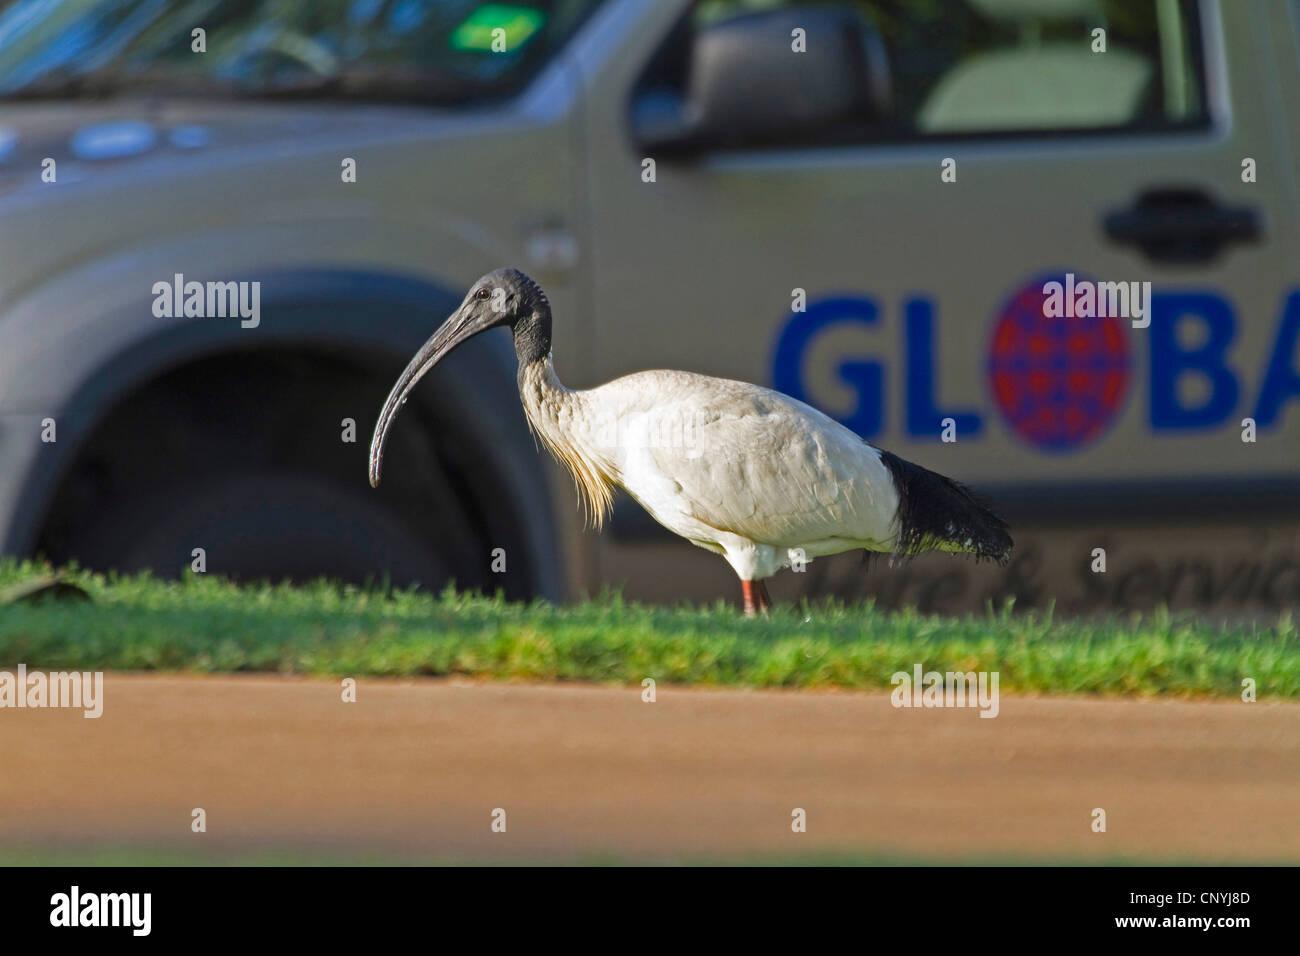 Australian white ibis (Threskiornis molucca), Australian White Ibis in city, Australia, Queensland, Townsville - Stock Image